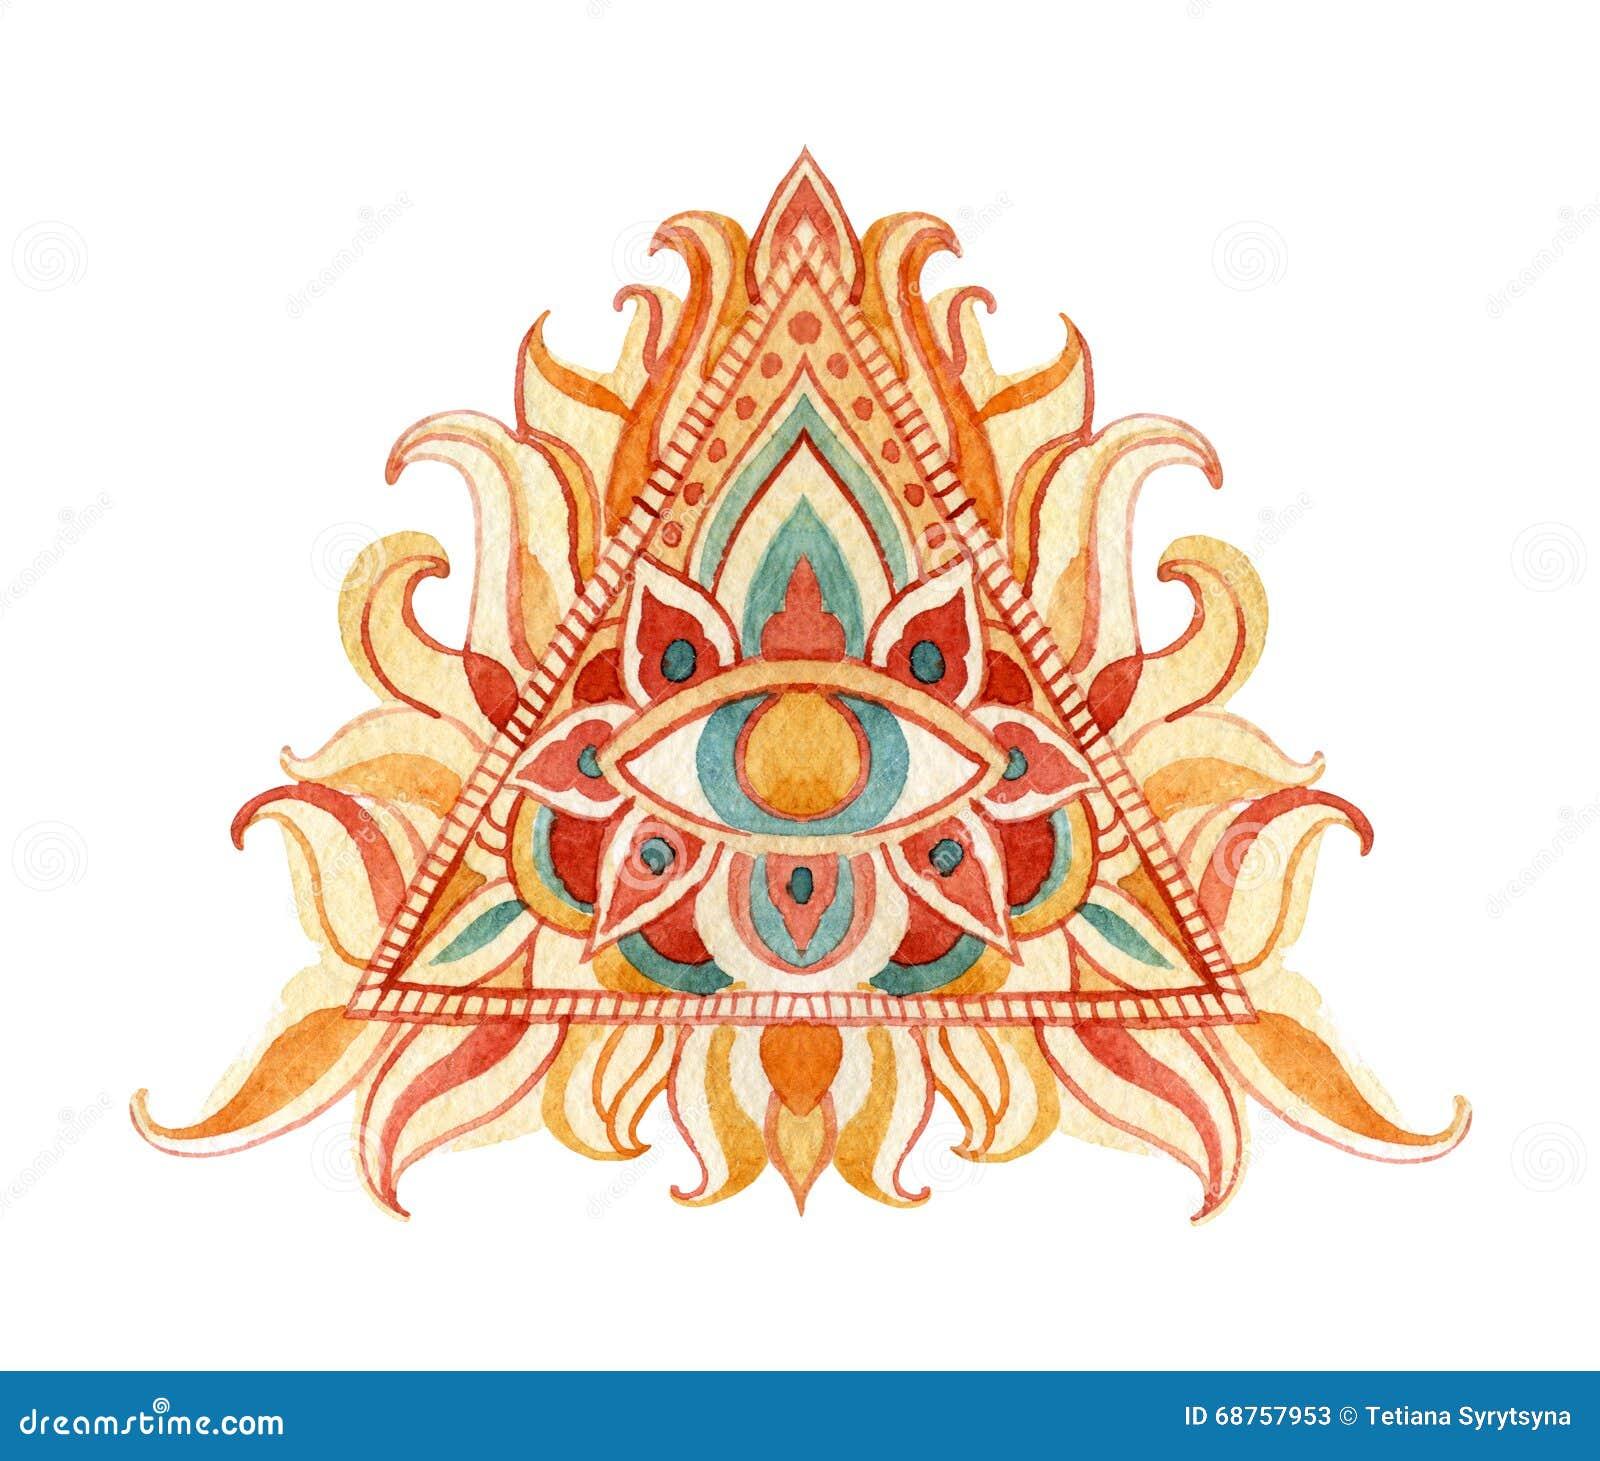 Aquarell alles sehende Augensymbol in der Pyramide